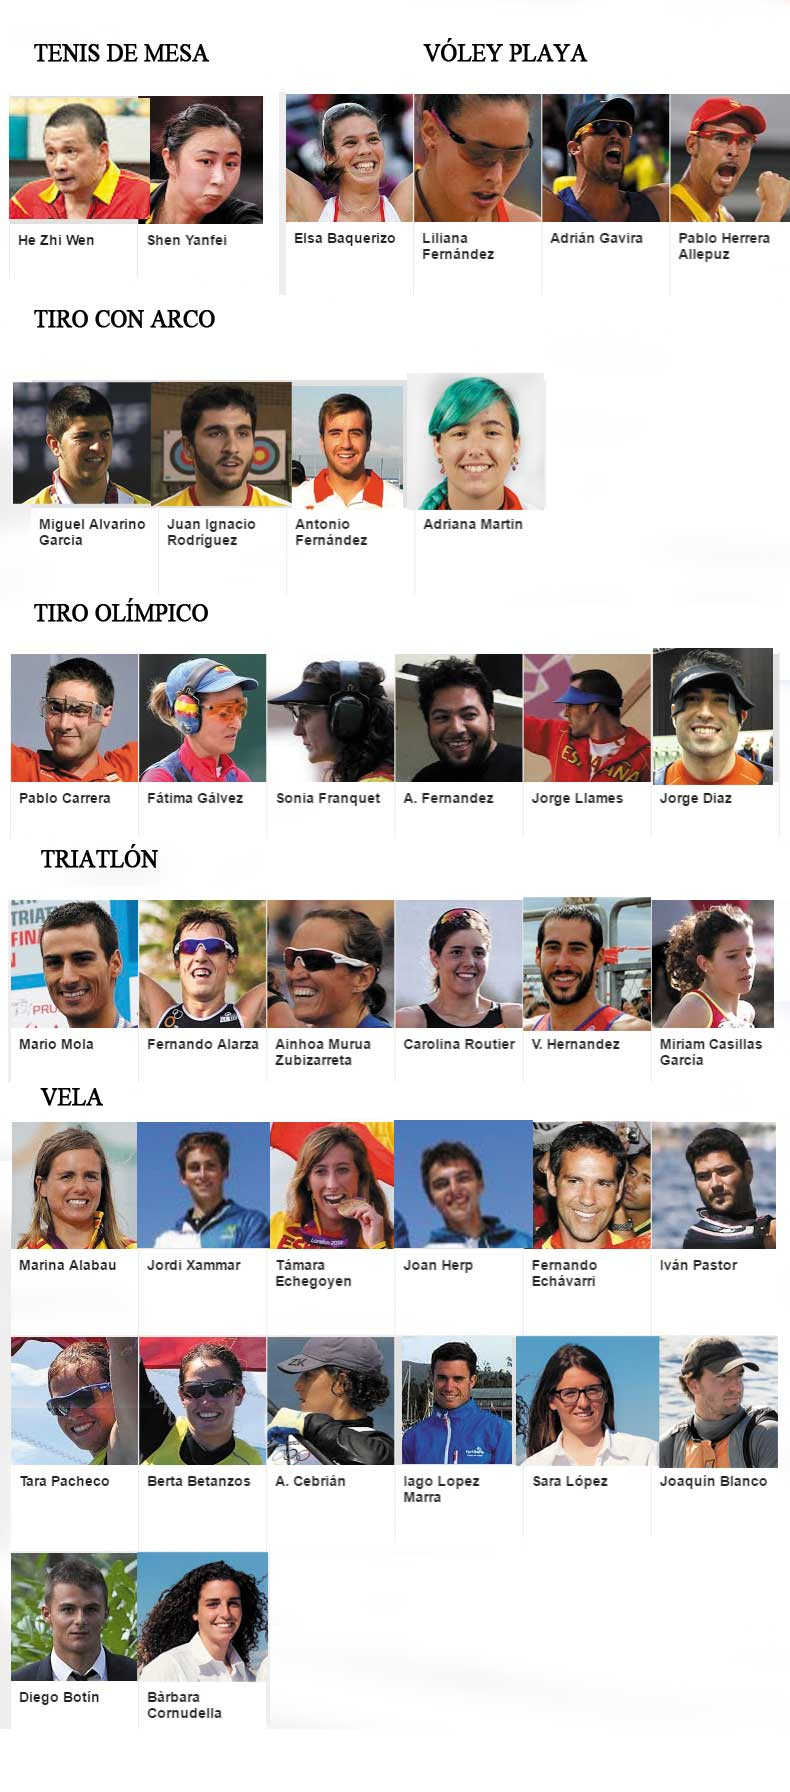 olimpicos-spain-rio-2016-tenis-mesa-voley-playa-vela-triatlon-tiro-arco-tiro-olimpico-avance-deportivo